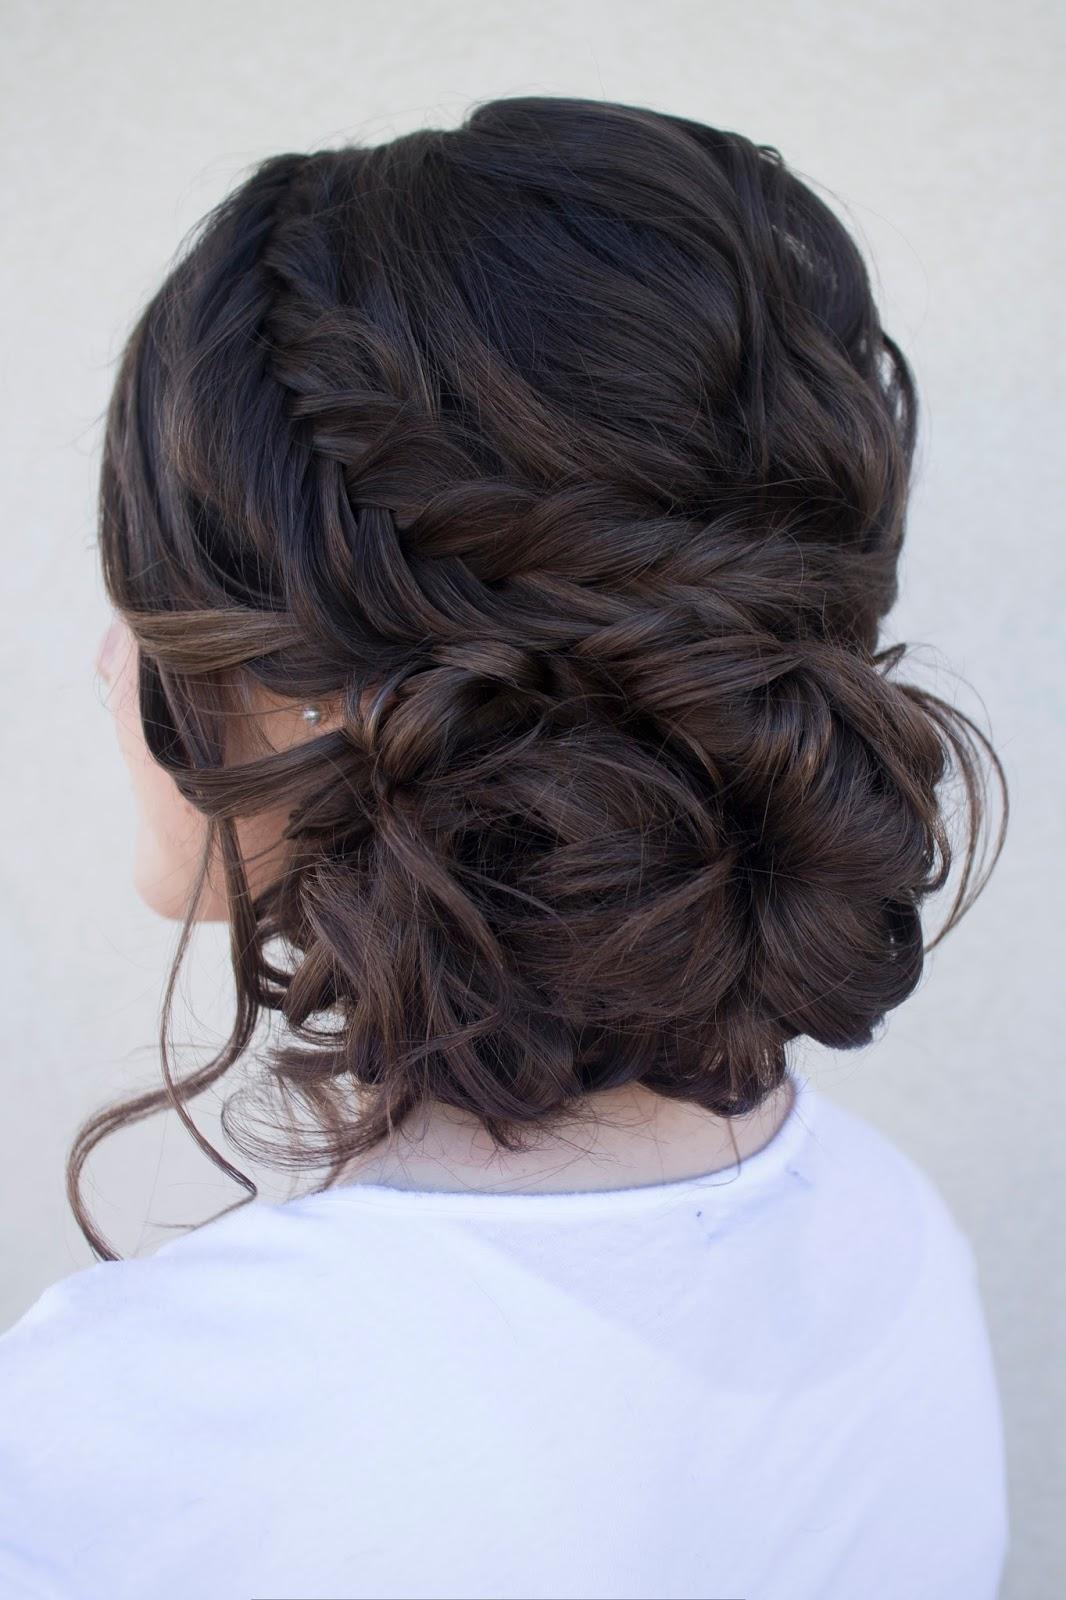 hair and make-up by steph: bridal photo shoot giveaway